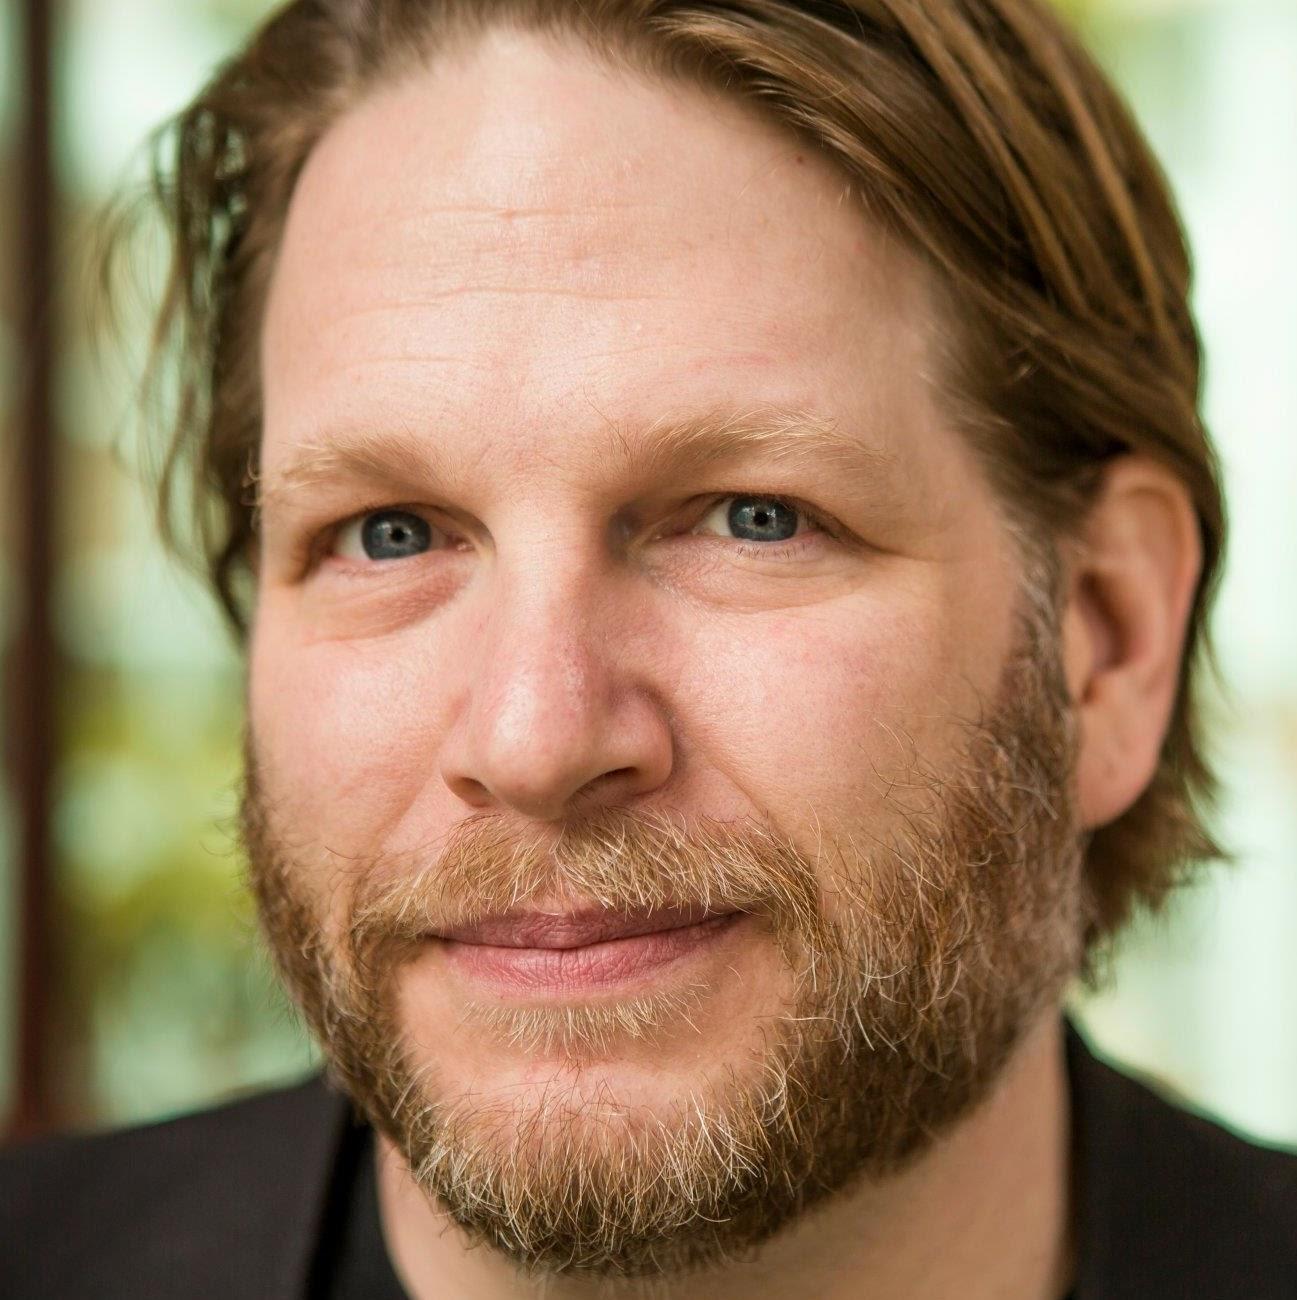 Chris Brogan | New York Times Bestselling Author & Speaker